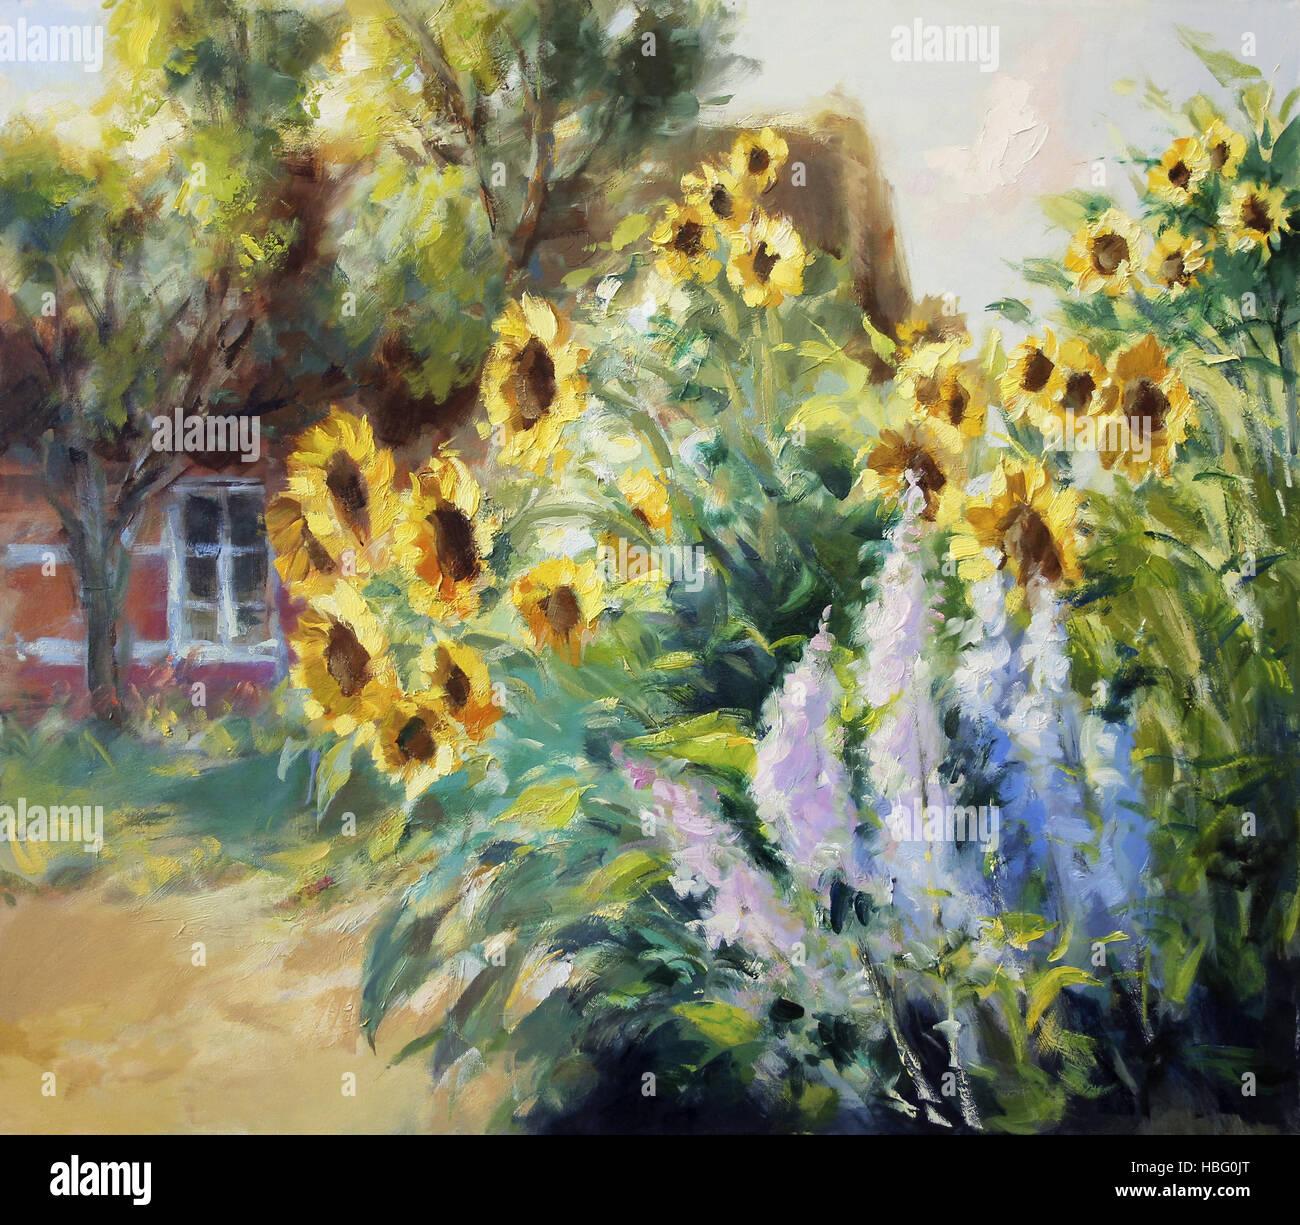 rural motif painting - Stock Image